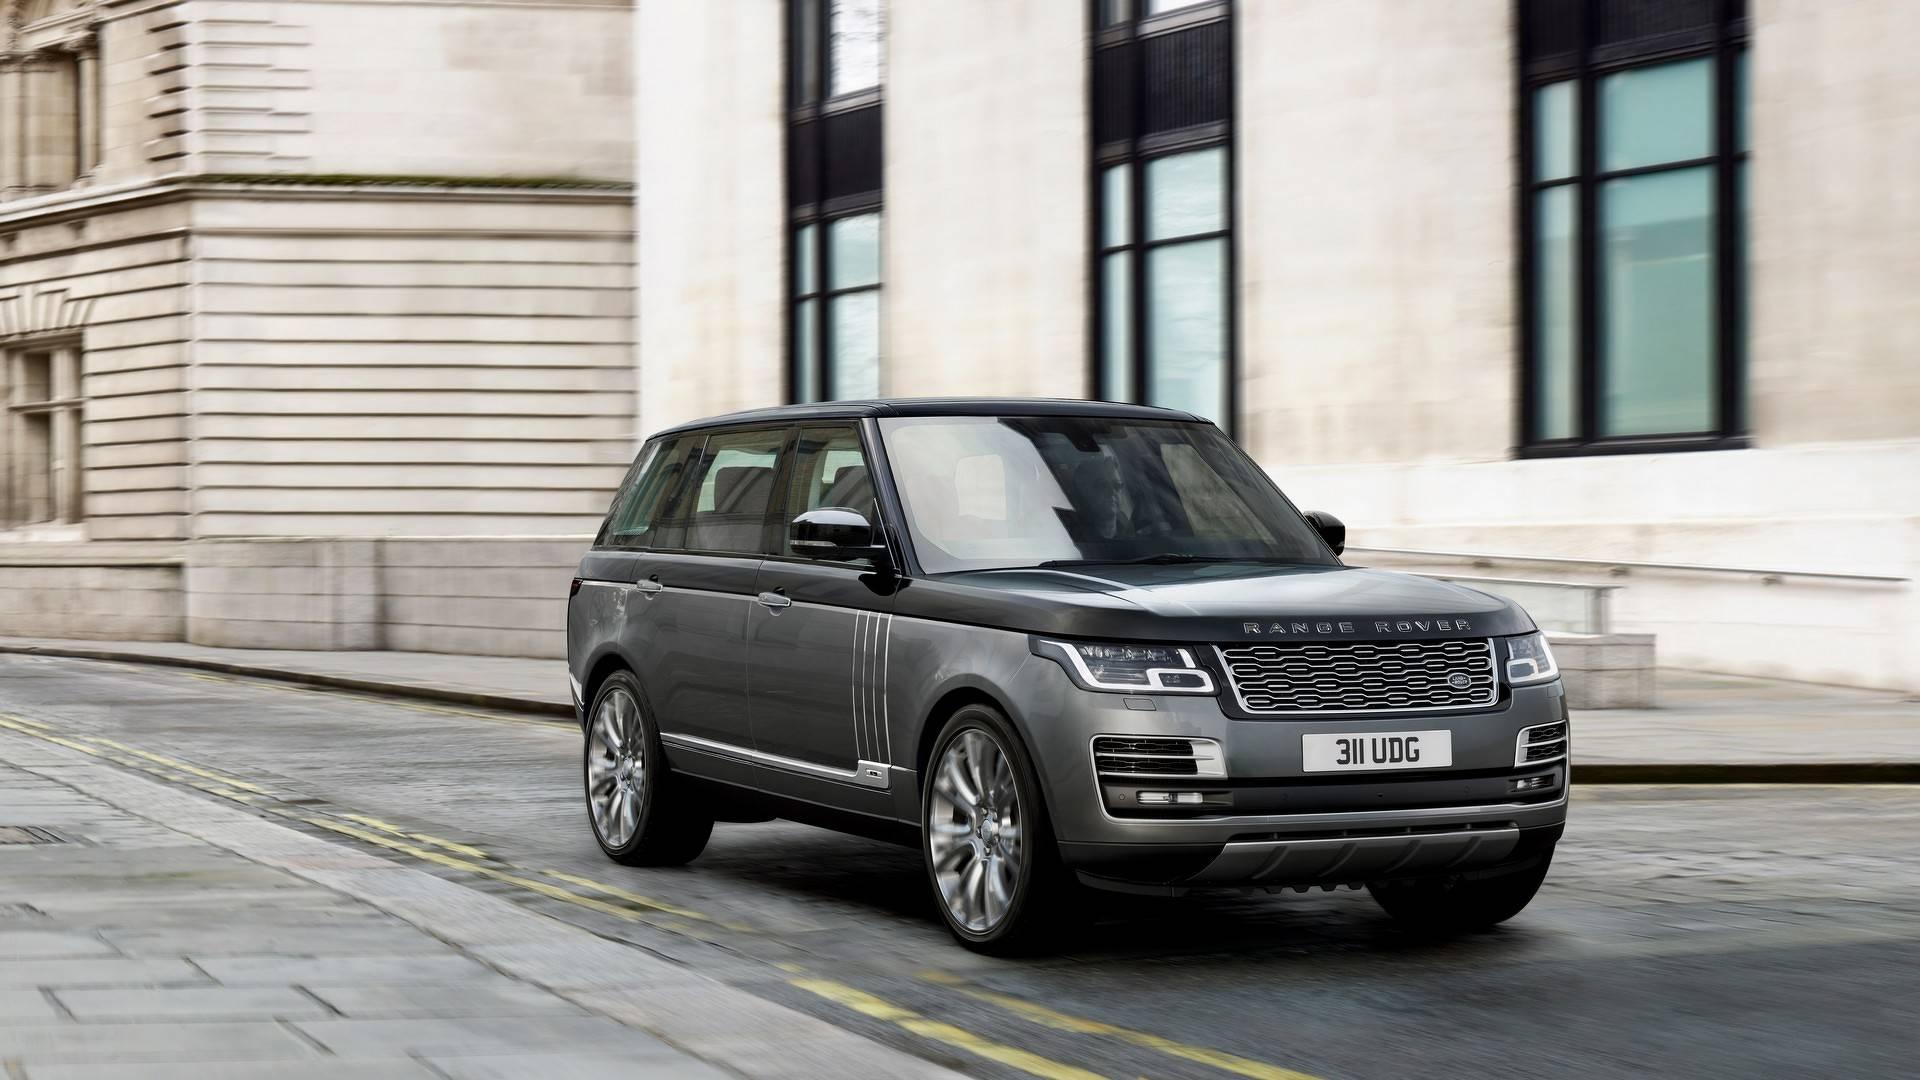 Range Rover picture